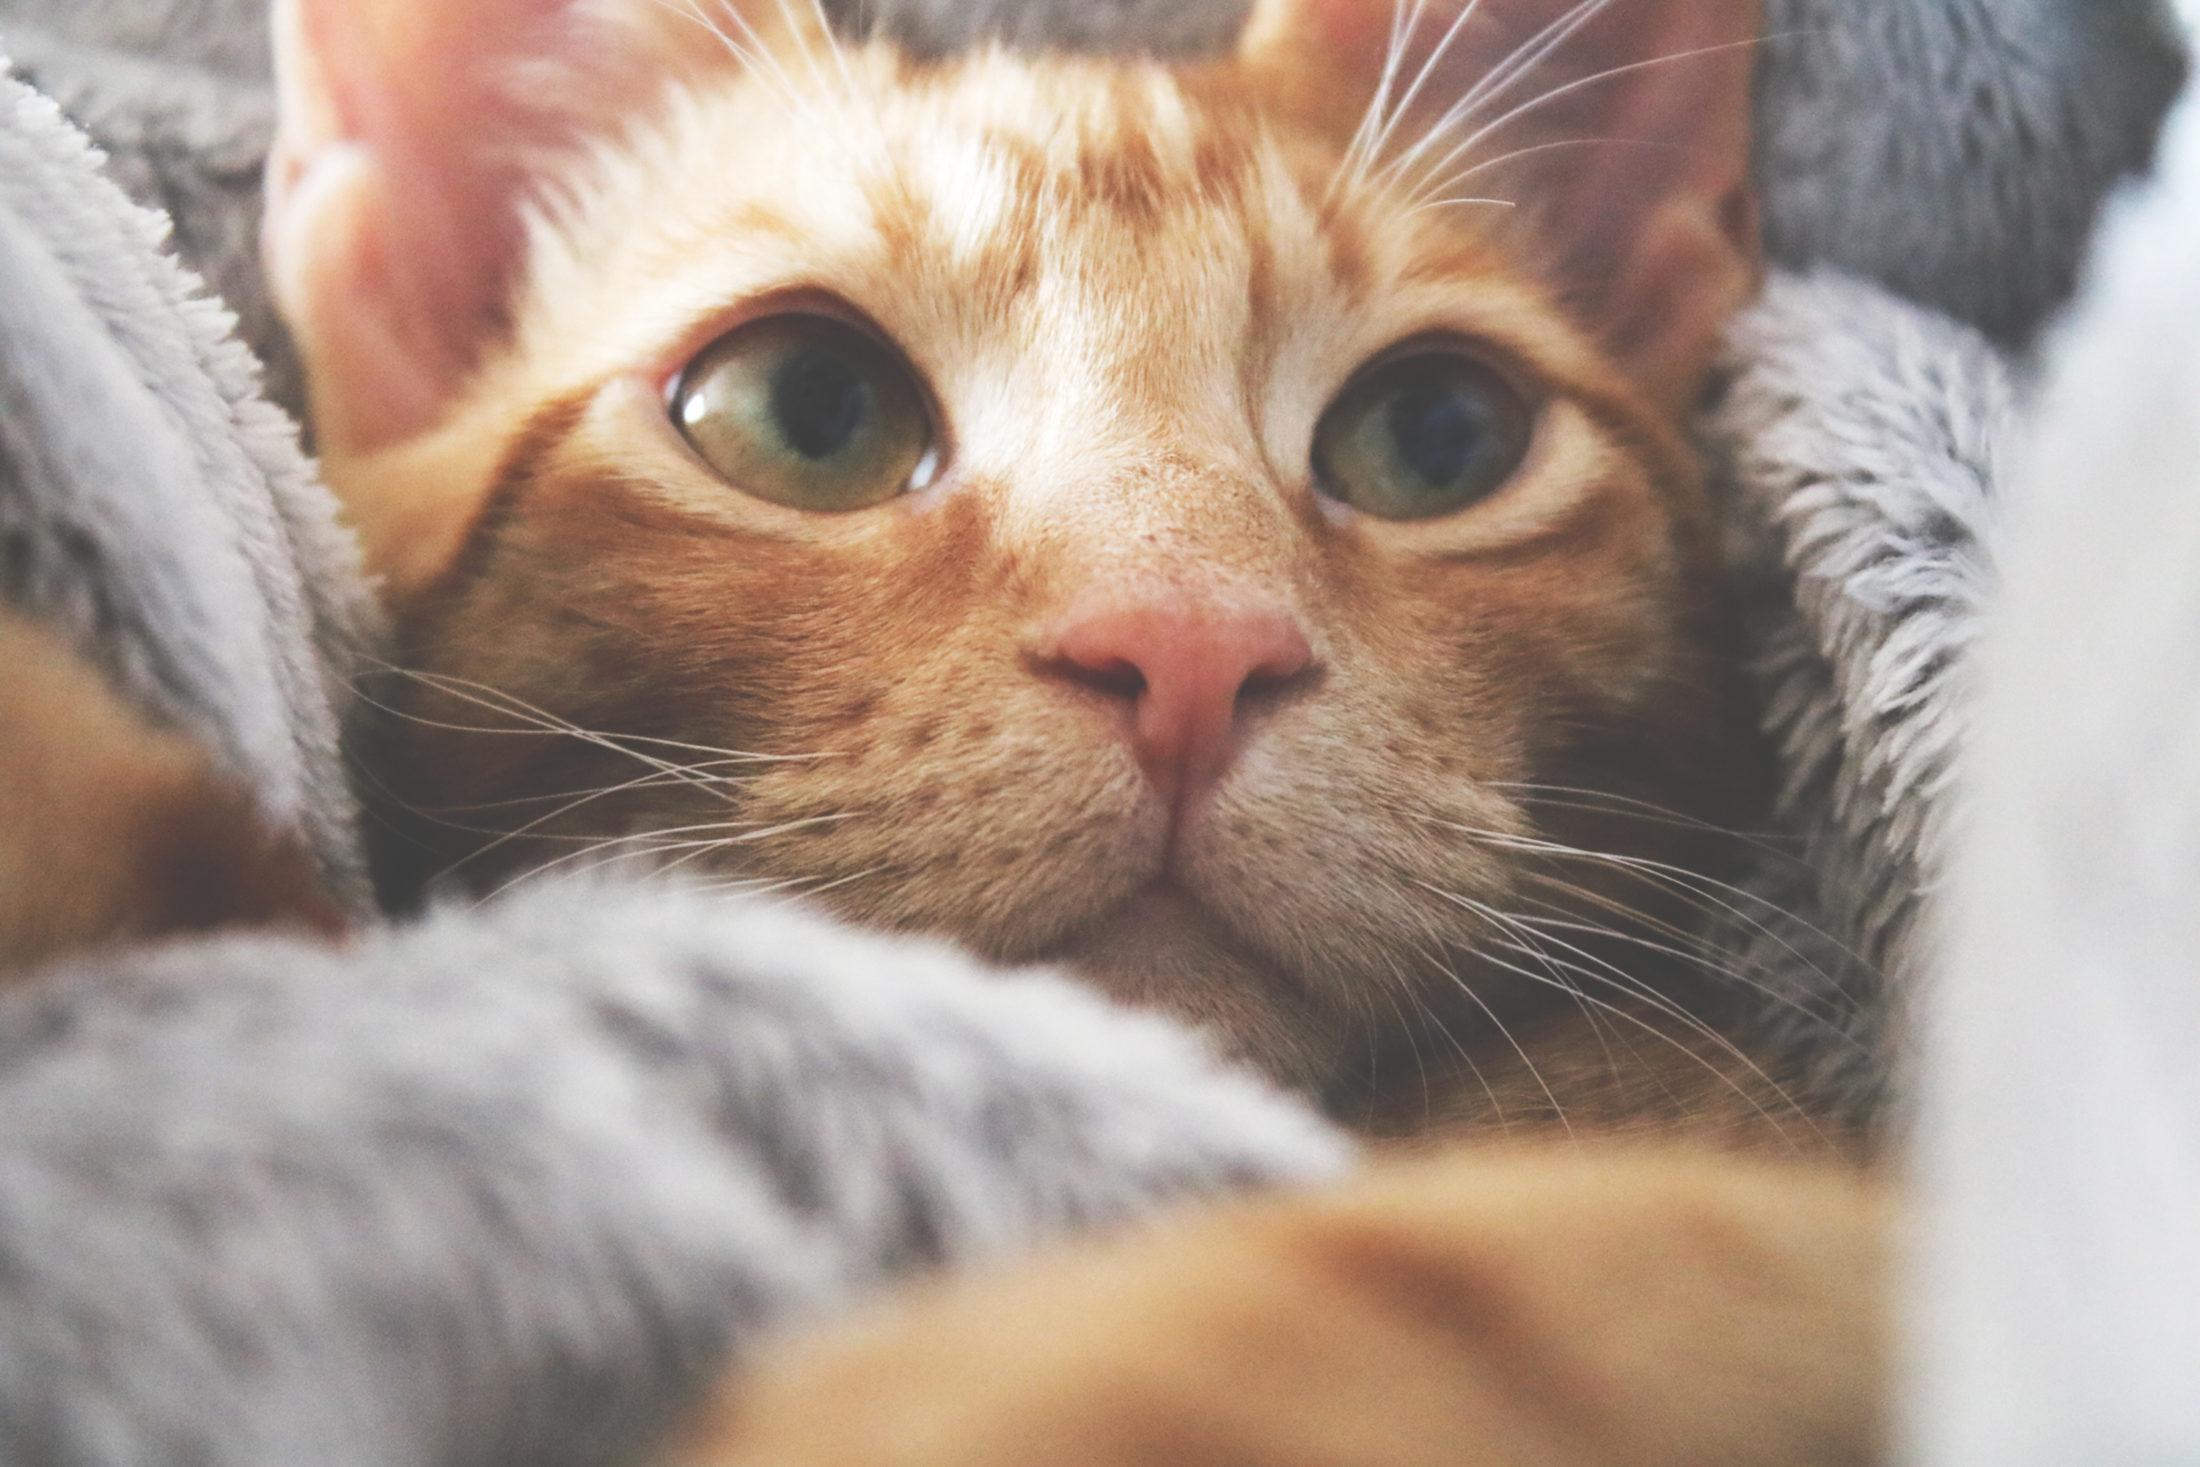 viajar com gato precisa levar cobertor dele